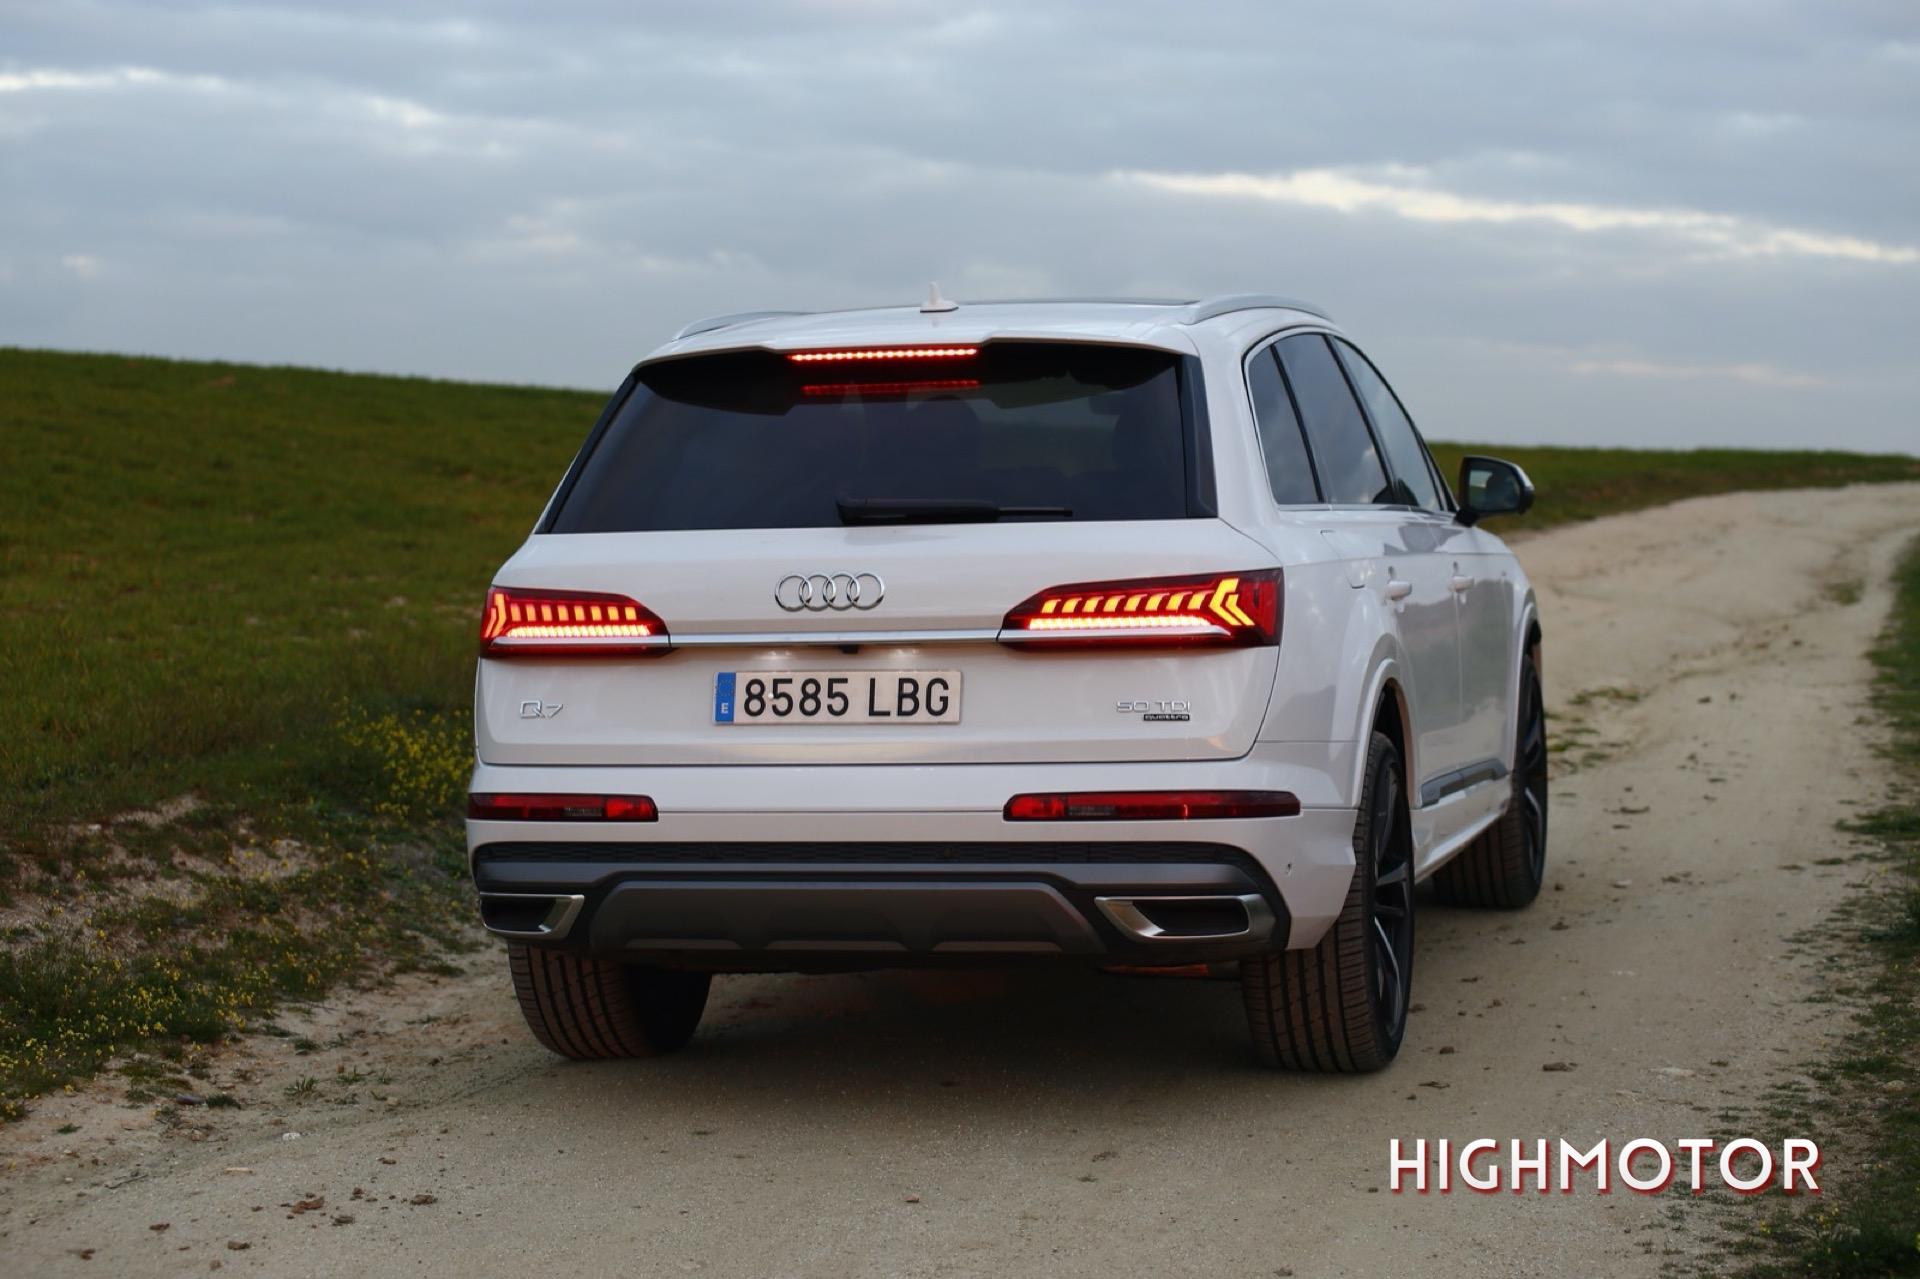 Audi Q7 Tdi 7